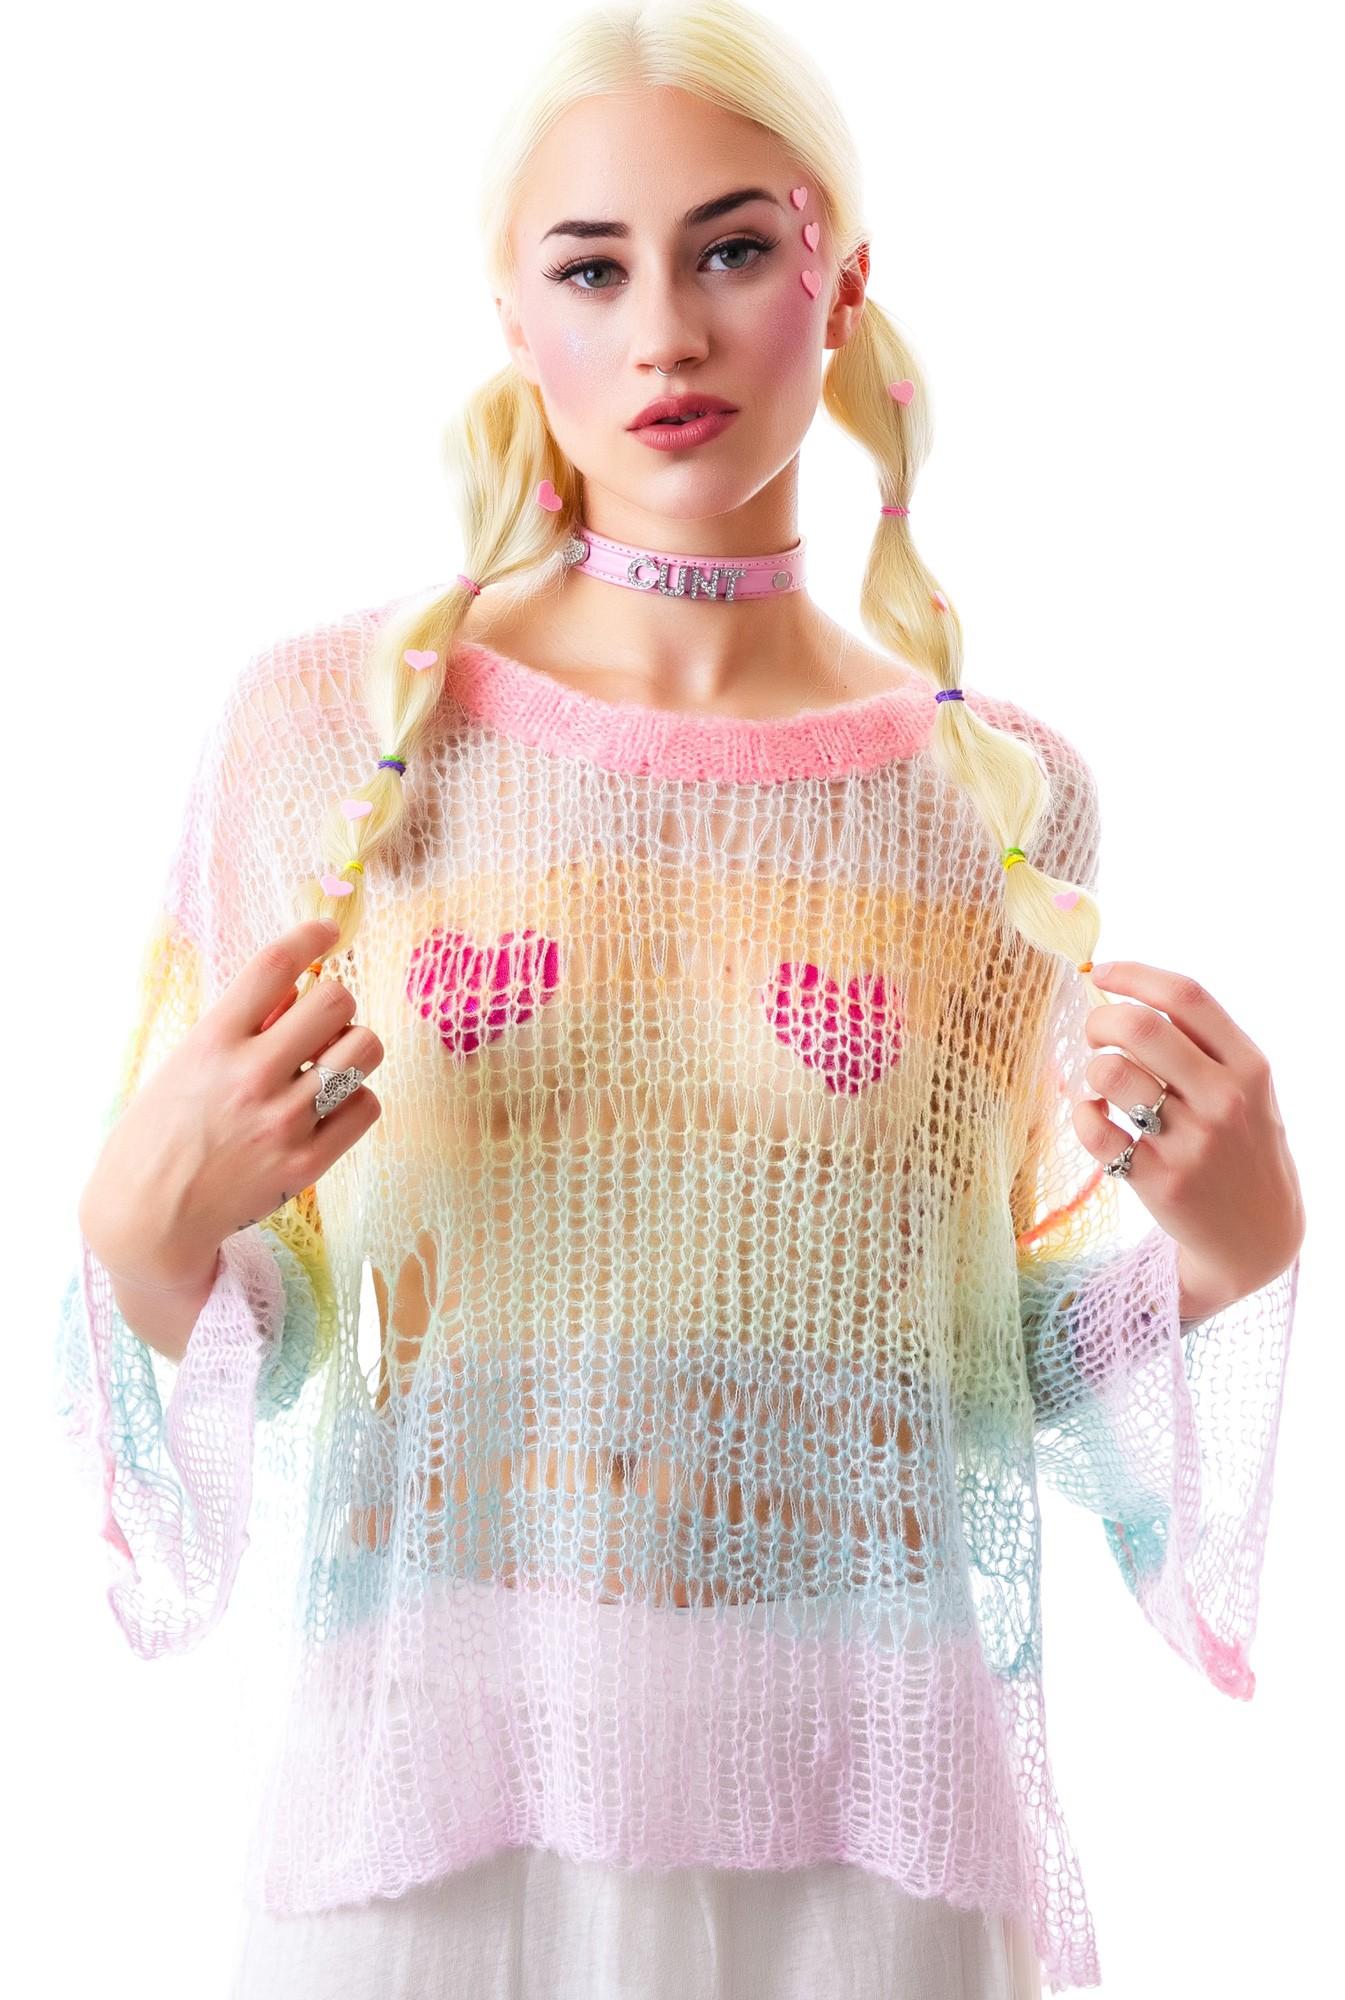 Wildfox couture rainbow ski bunny lost sweater